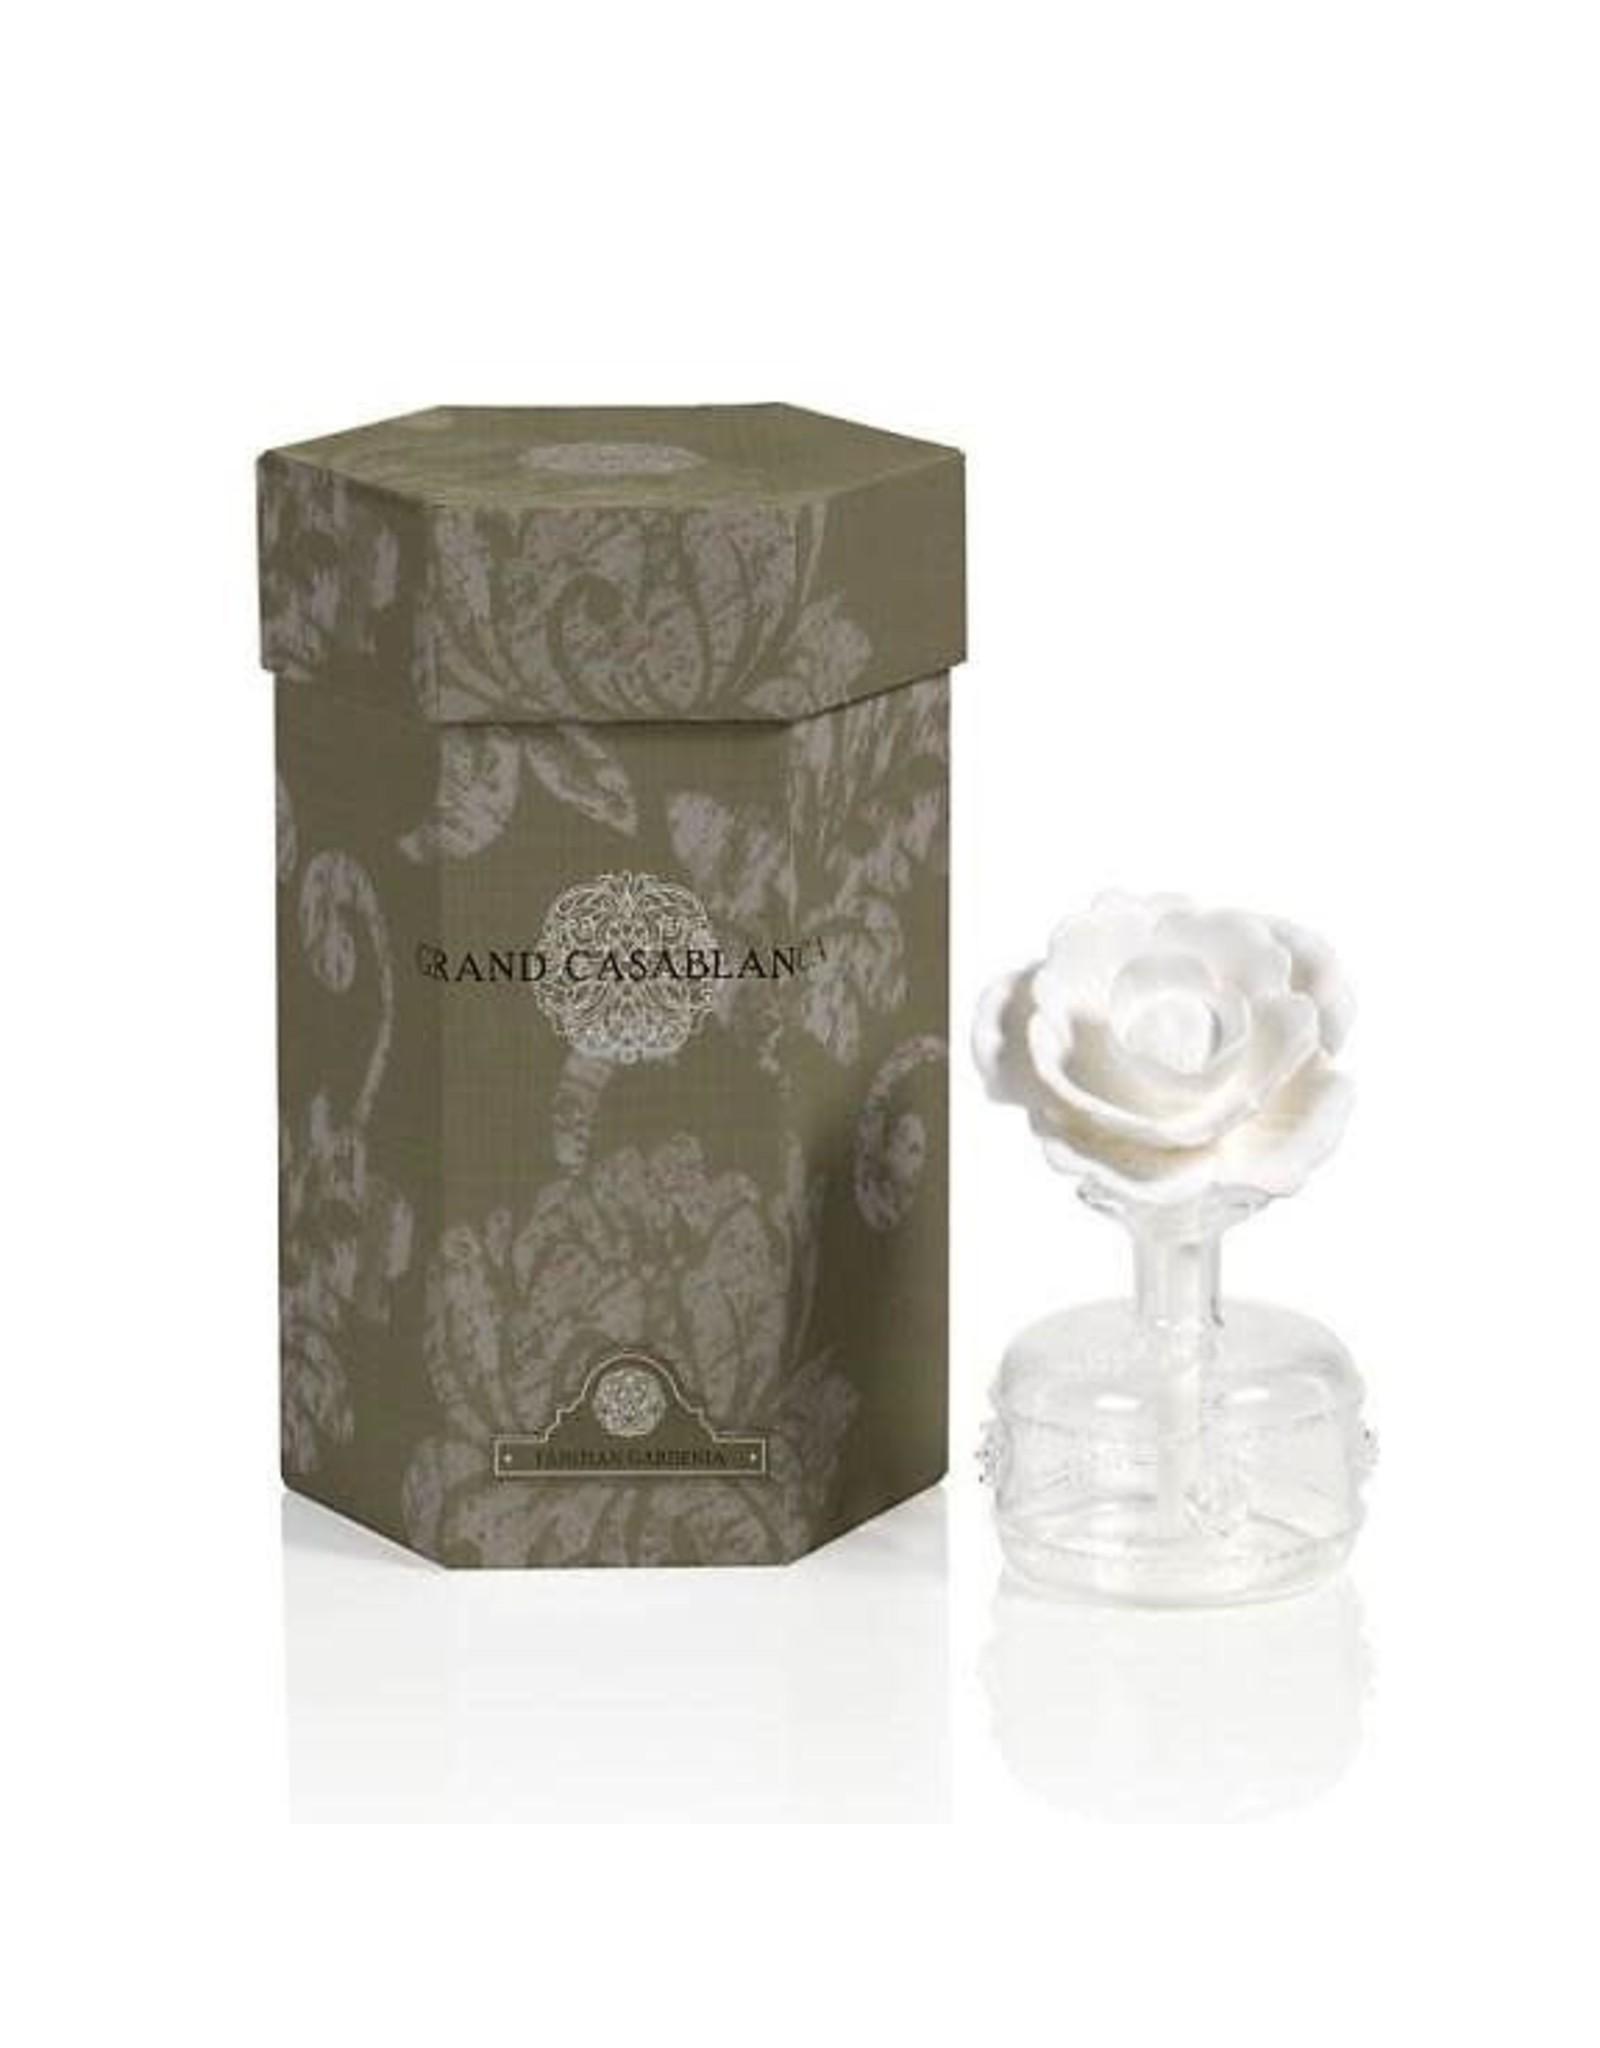 Porcelain Diffuser REFILL - Tahitian Gardenia